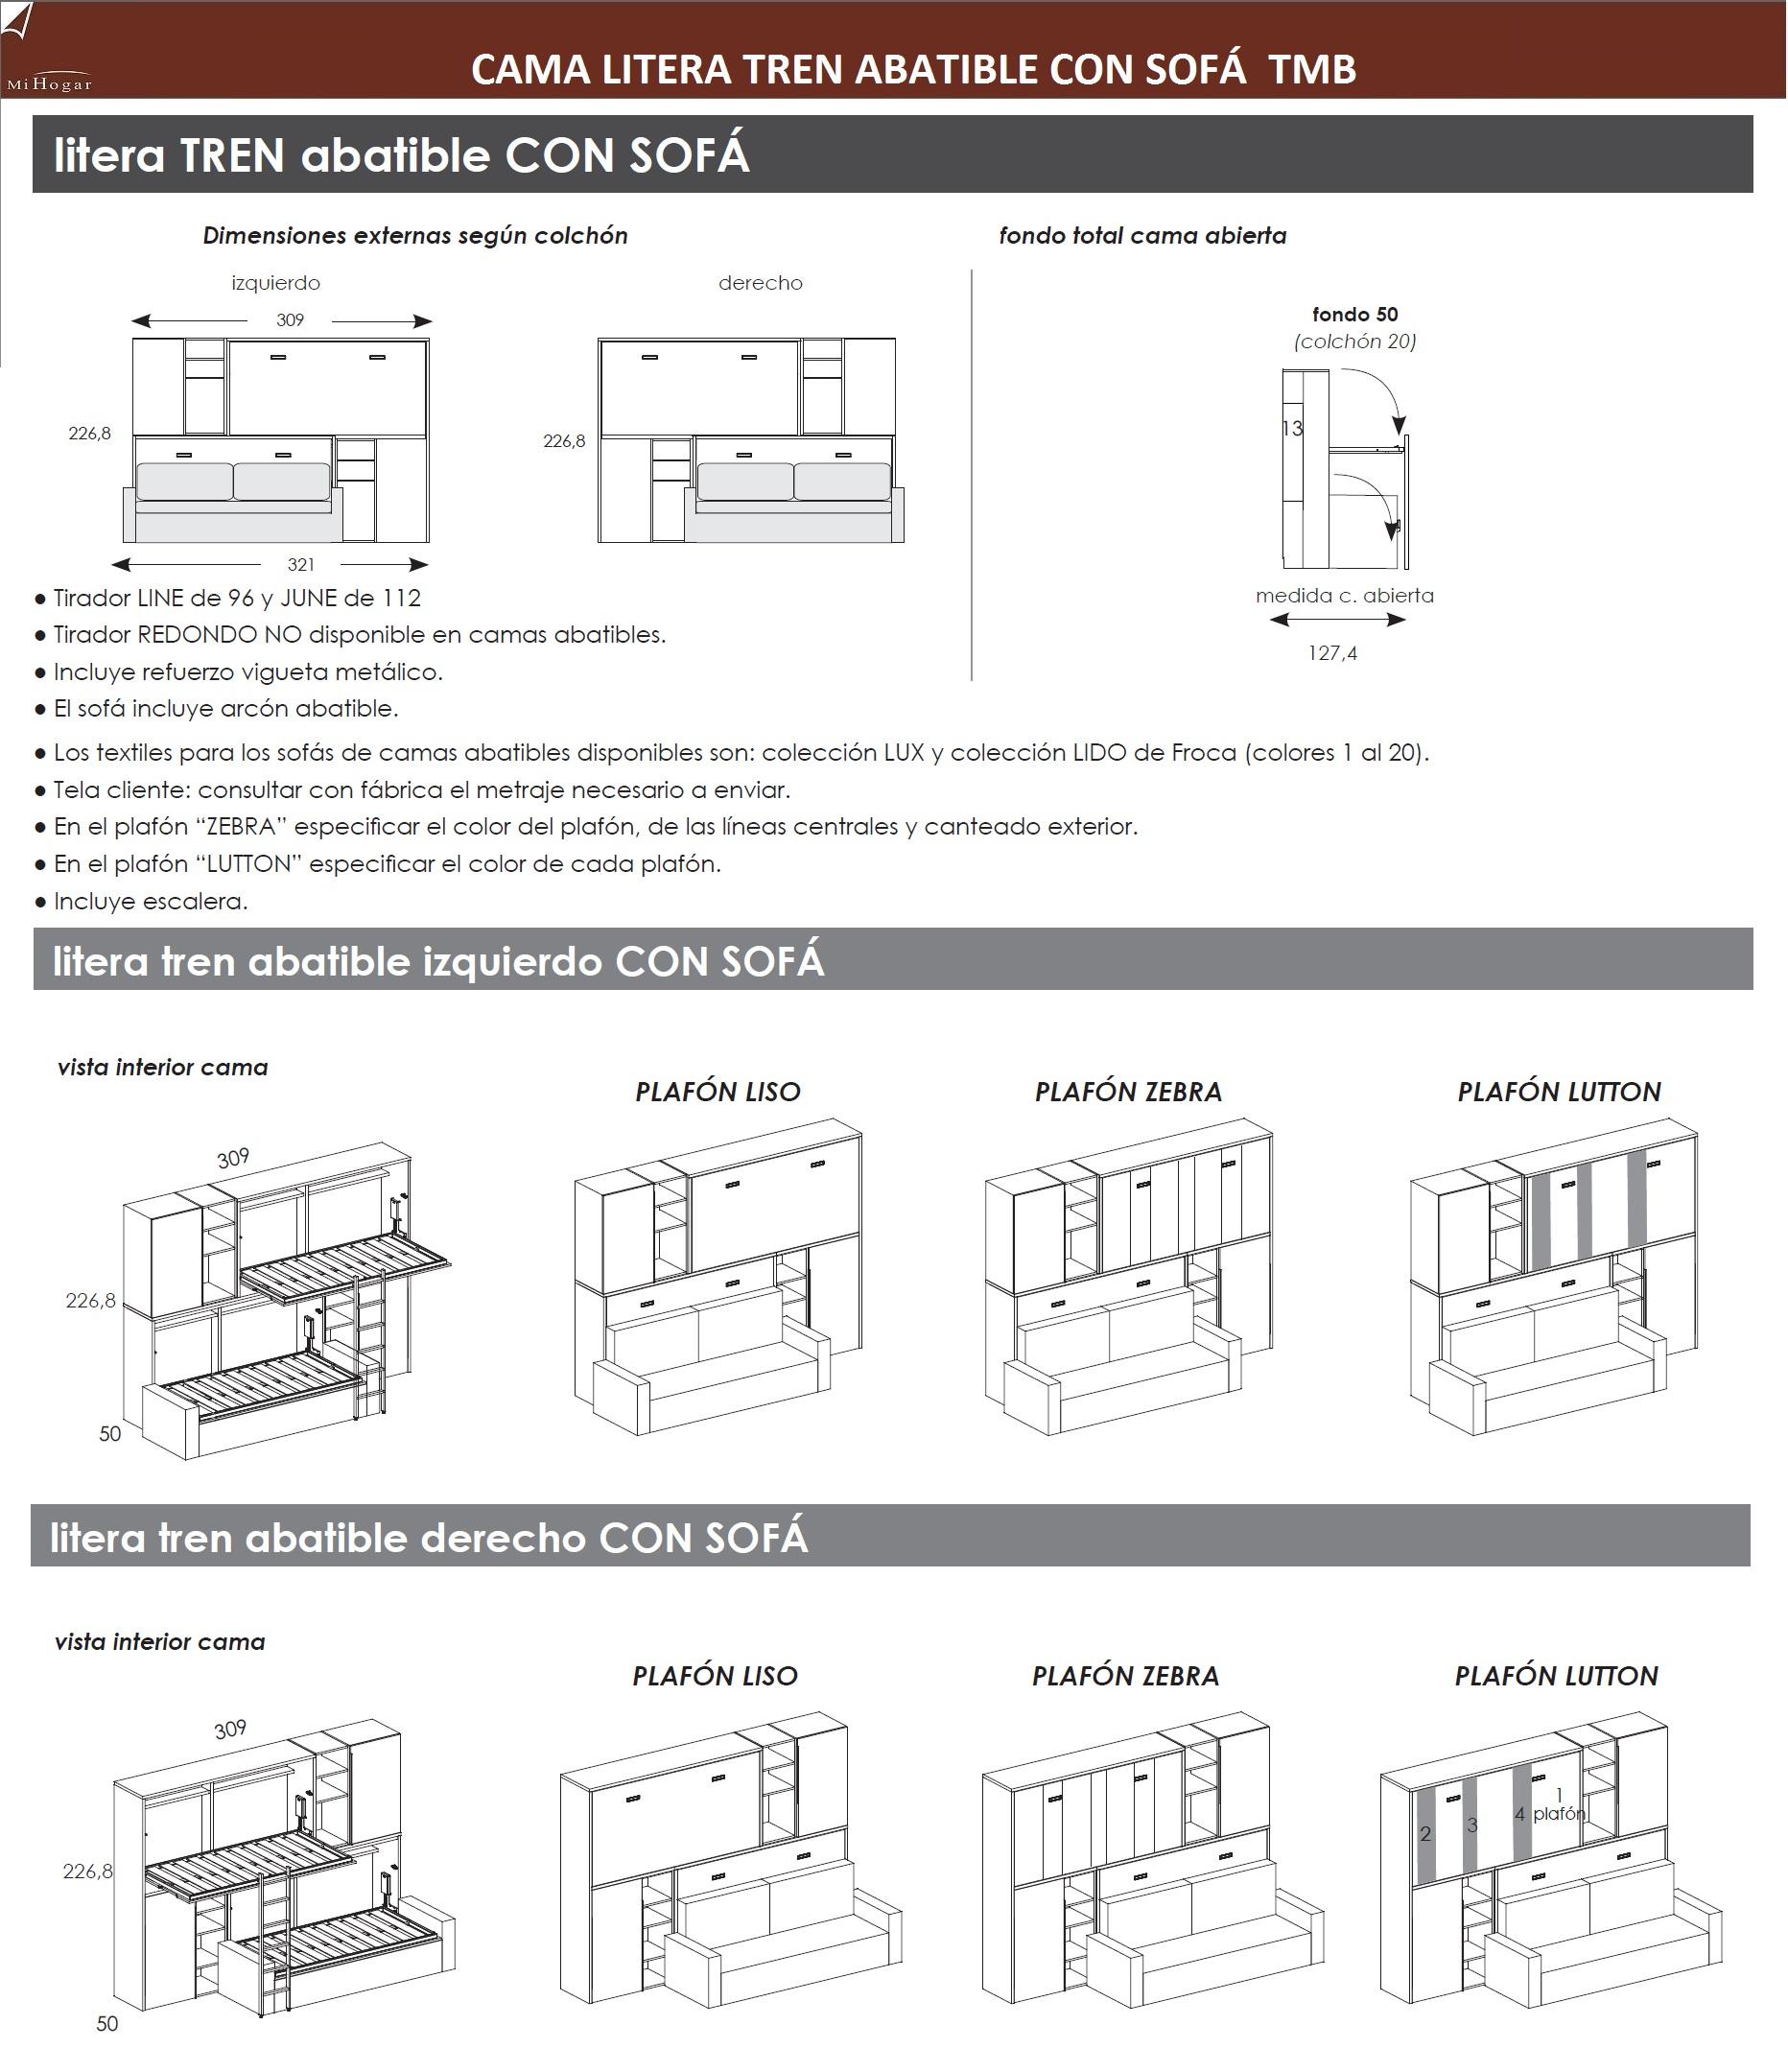 Cama abatible horizontal con sofa tmb muebles mi hogar - Literas tren medidas ...